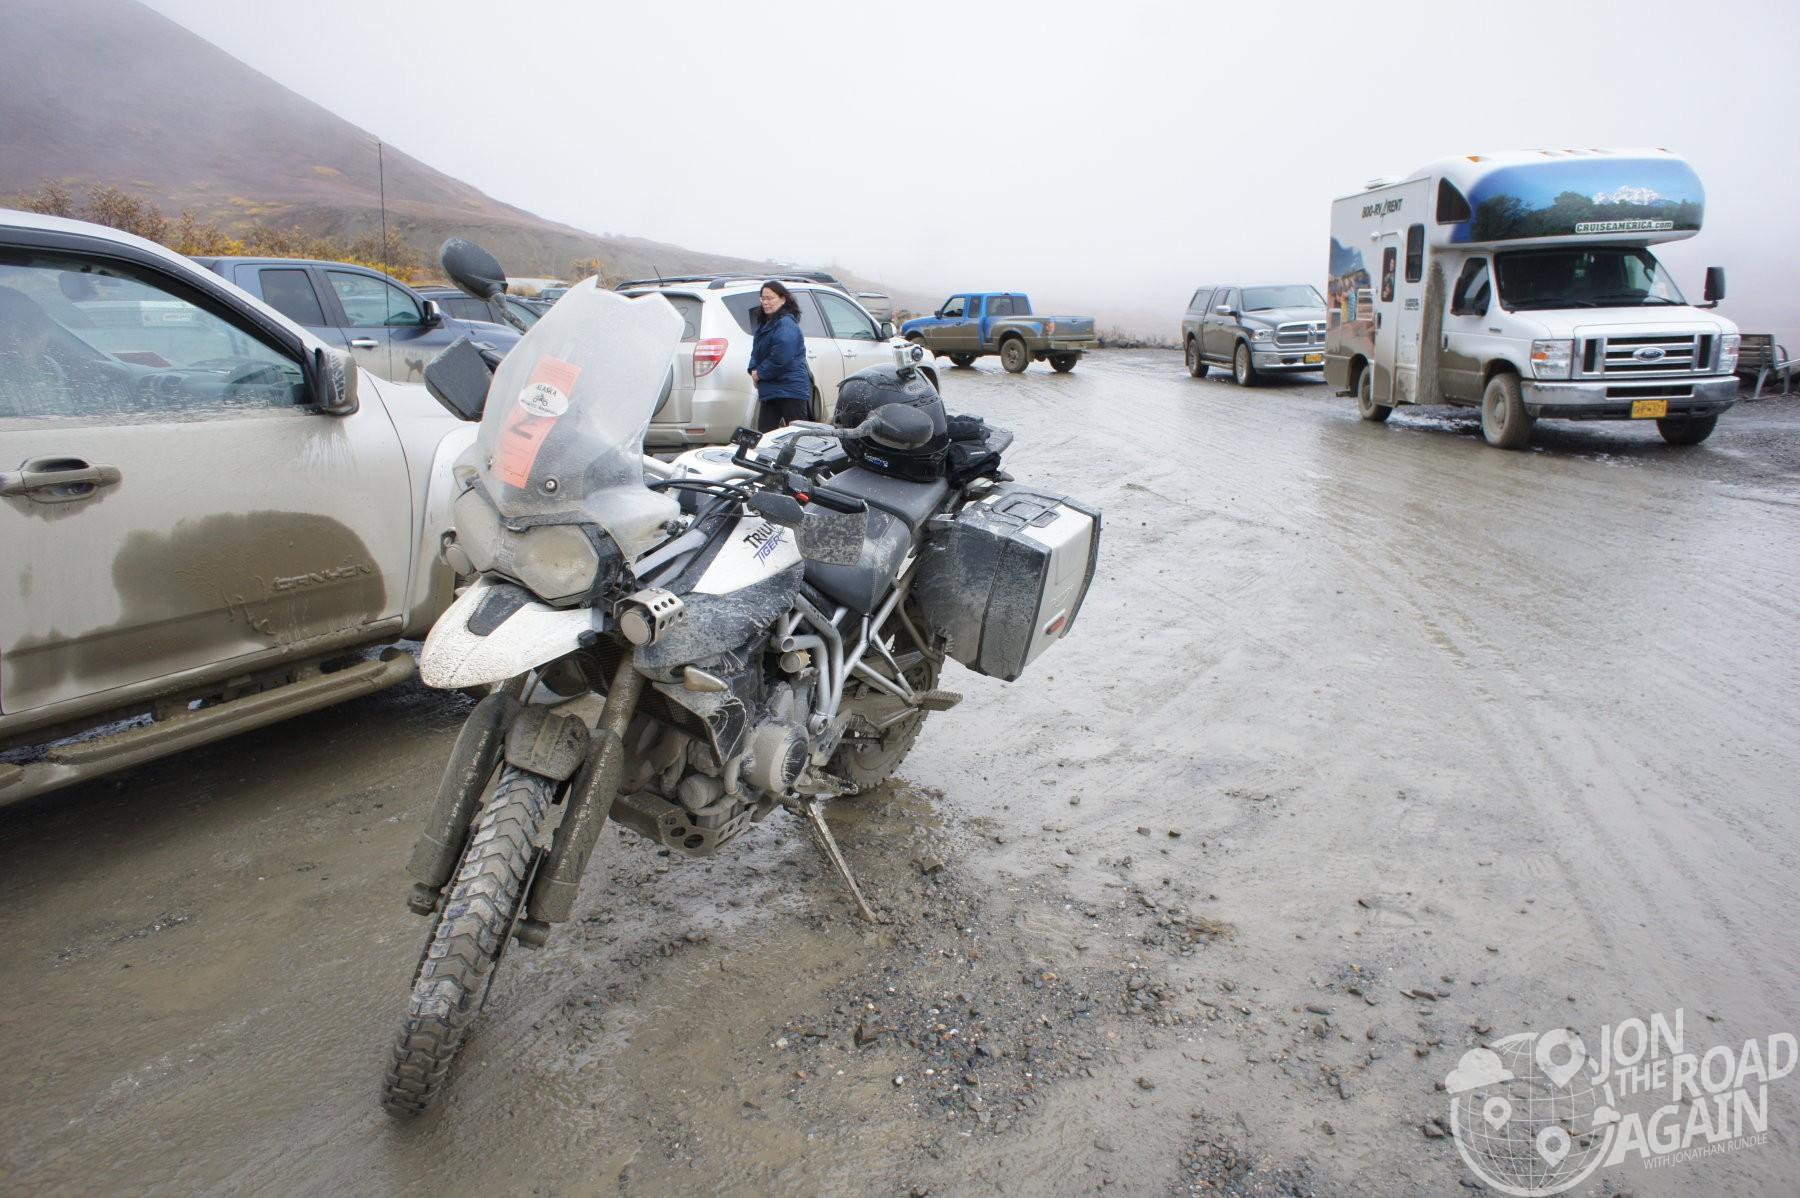 Triumph Tiger covered in Mud